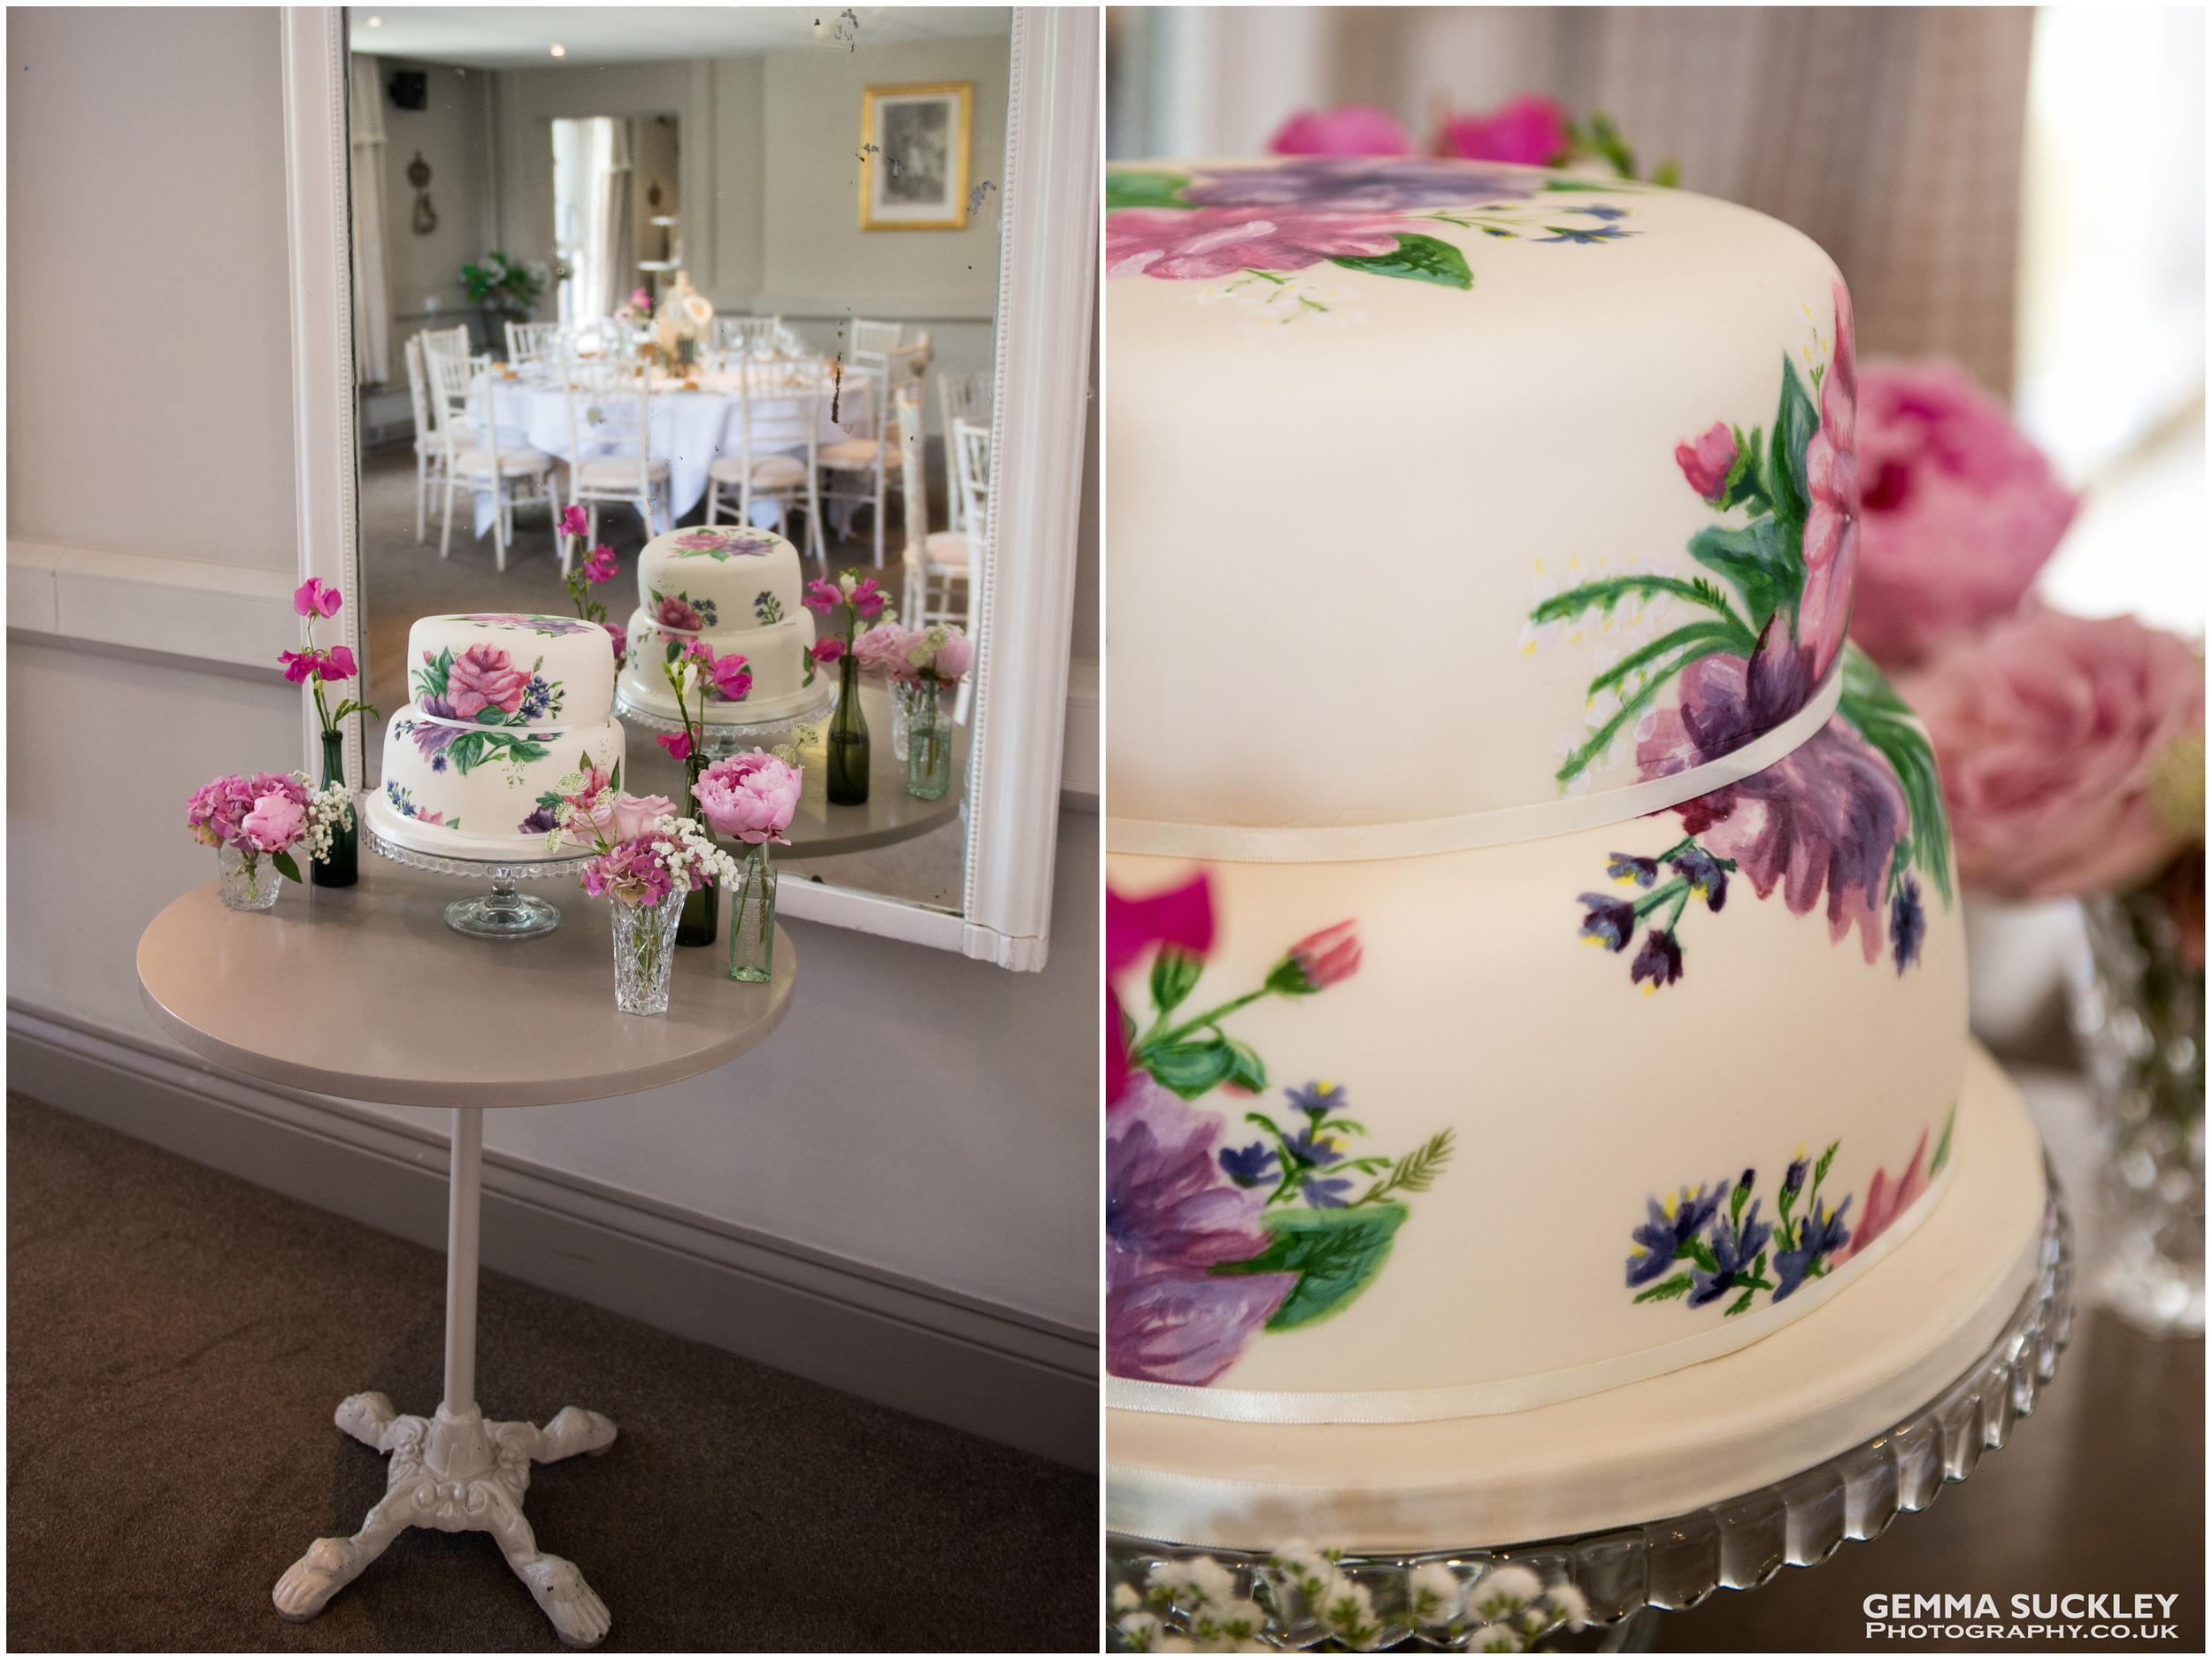 sugar-monkey-wedding-cake.jpg